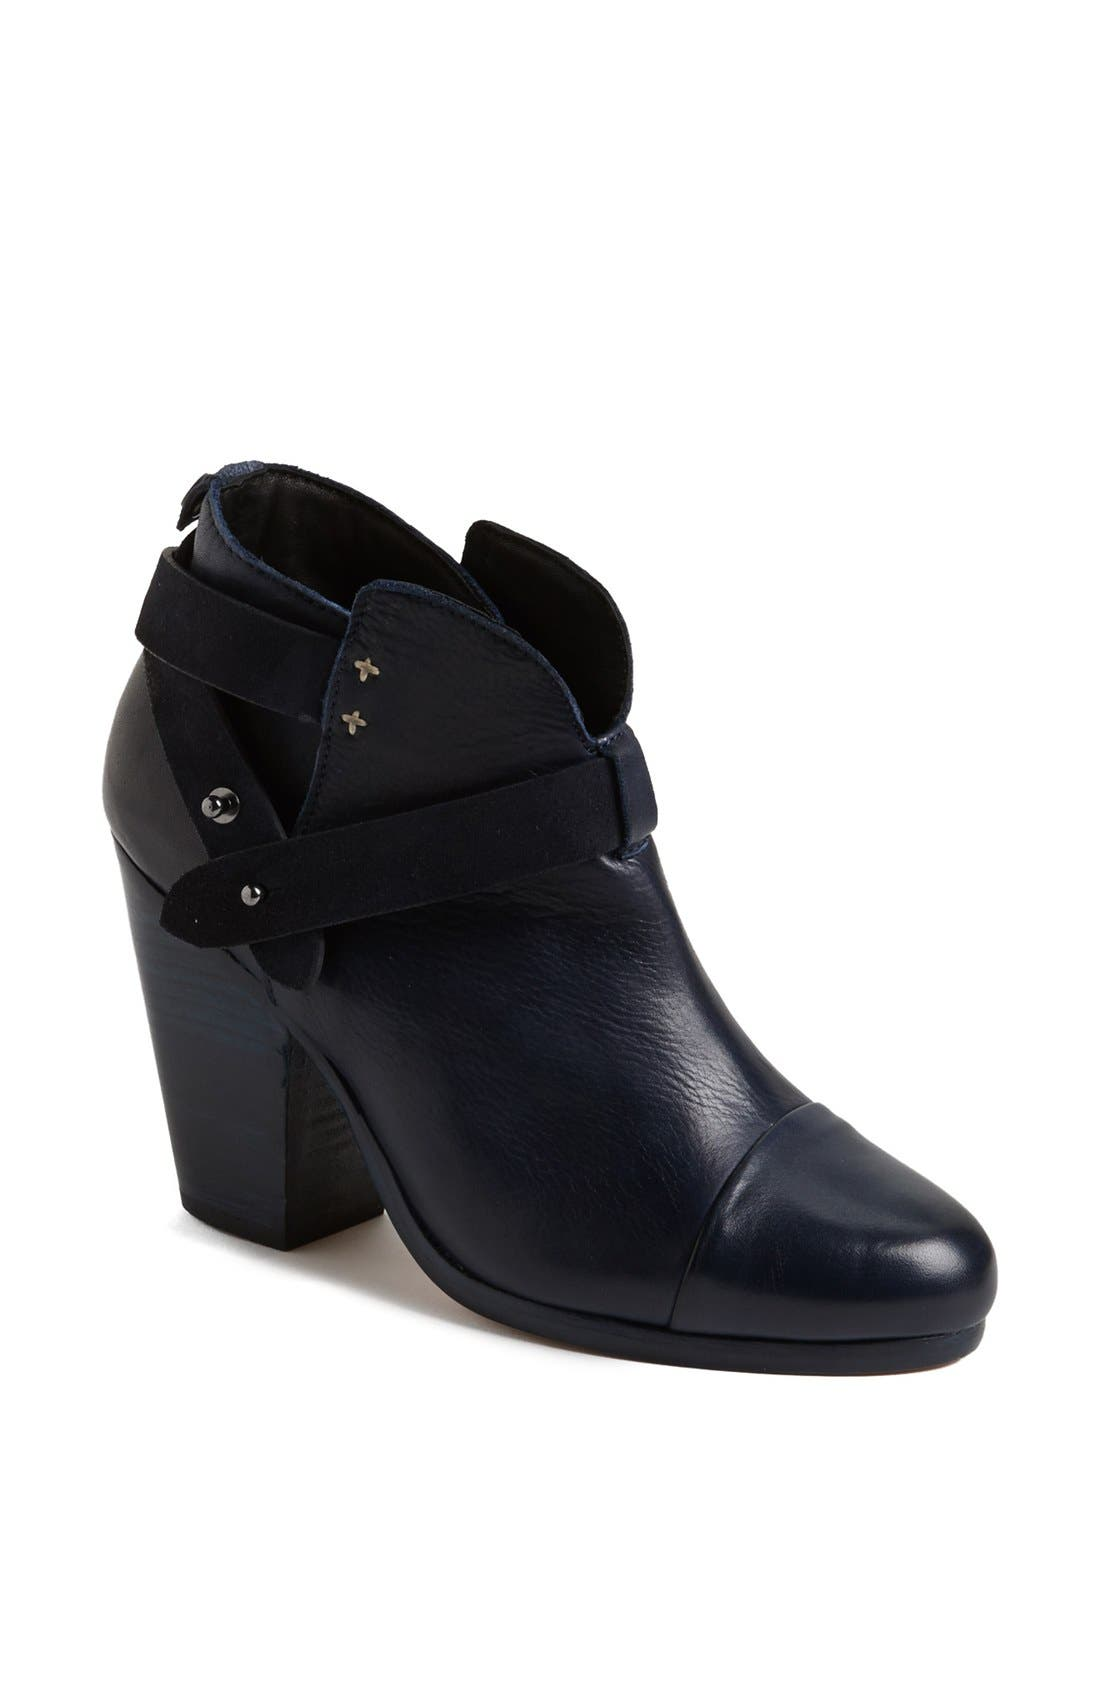 Alternate Image 1 Selected - rag & bone 'Harrow' Ankle Boot